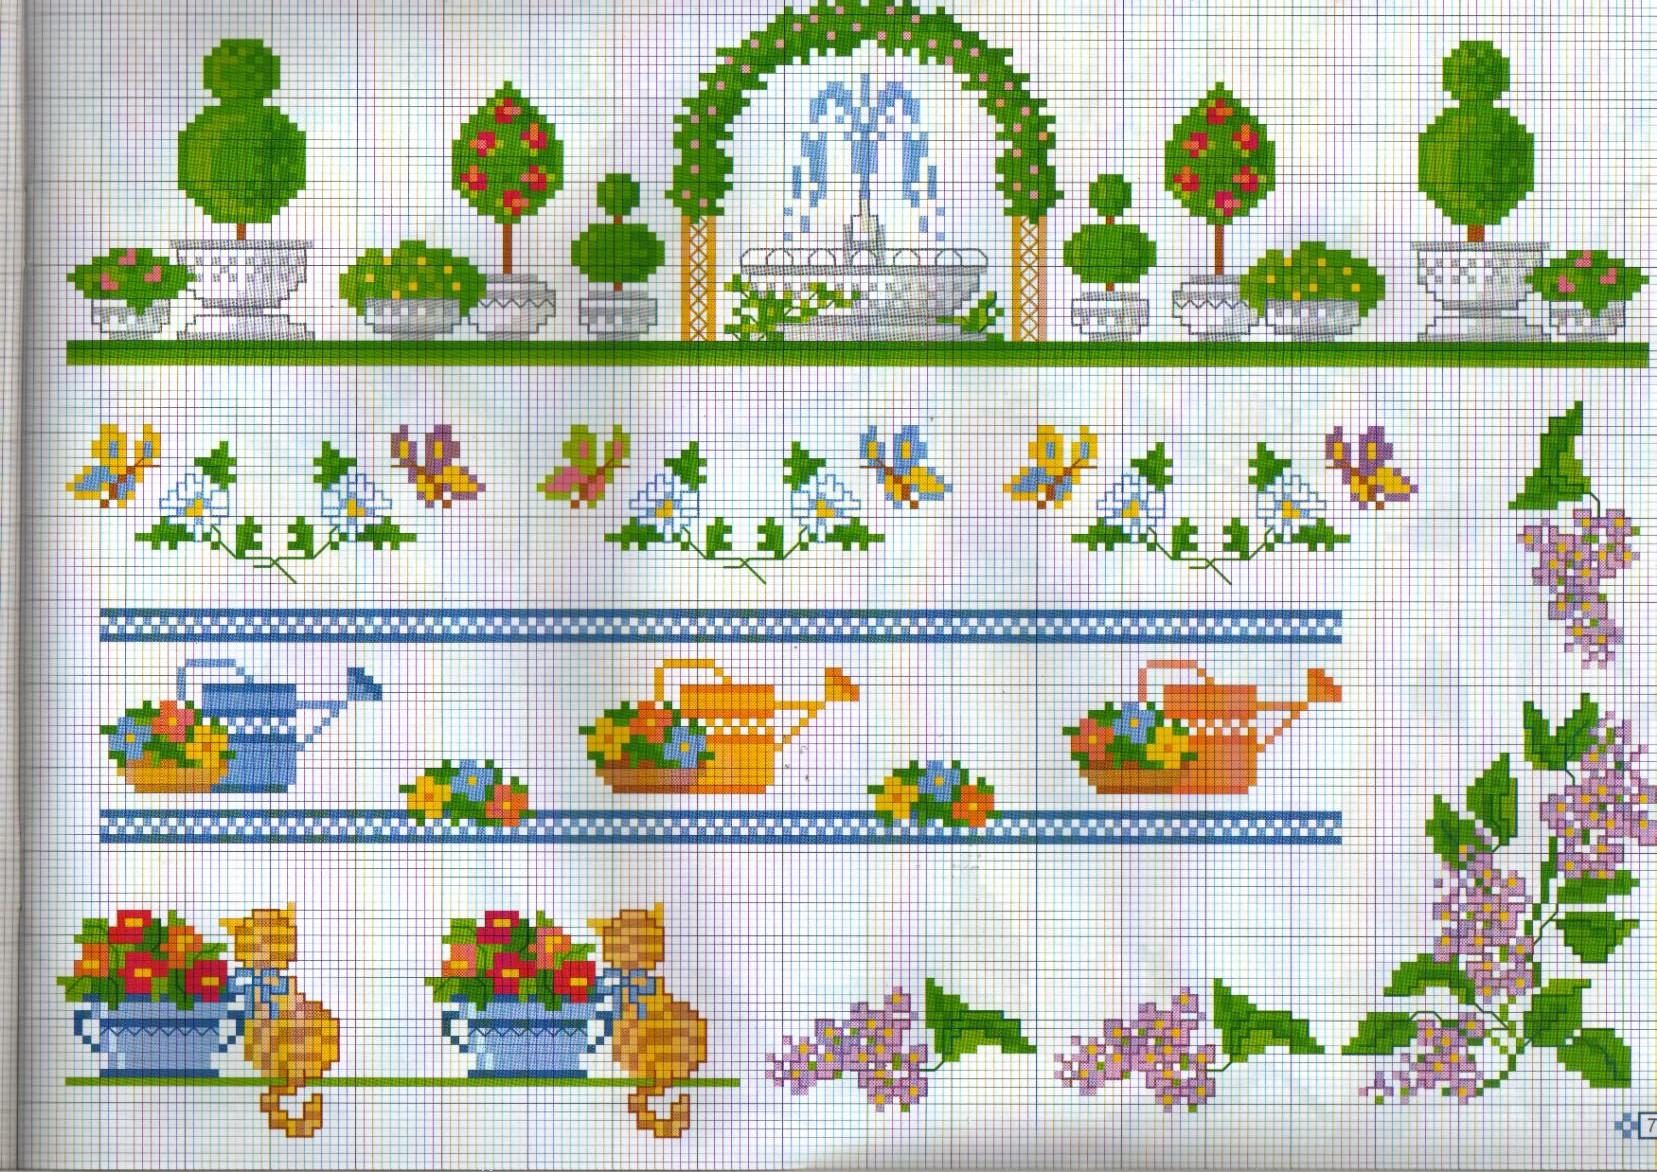 Bordure giardino fontana punto croce - Punto jardin ...